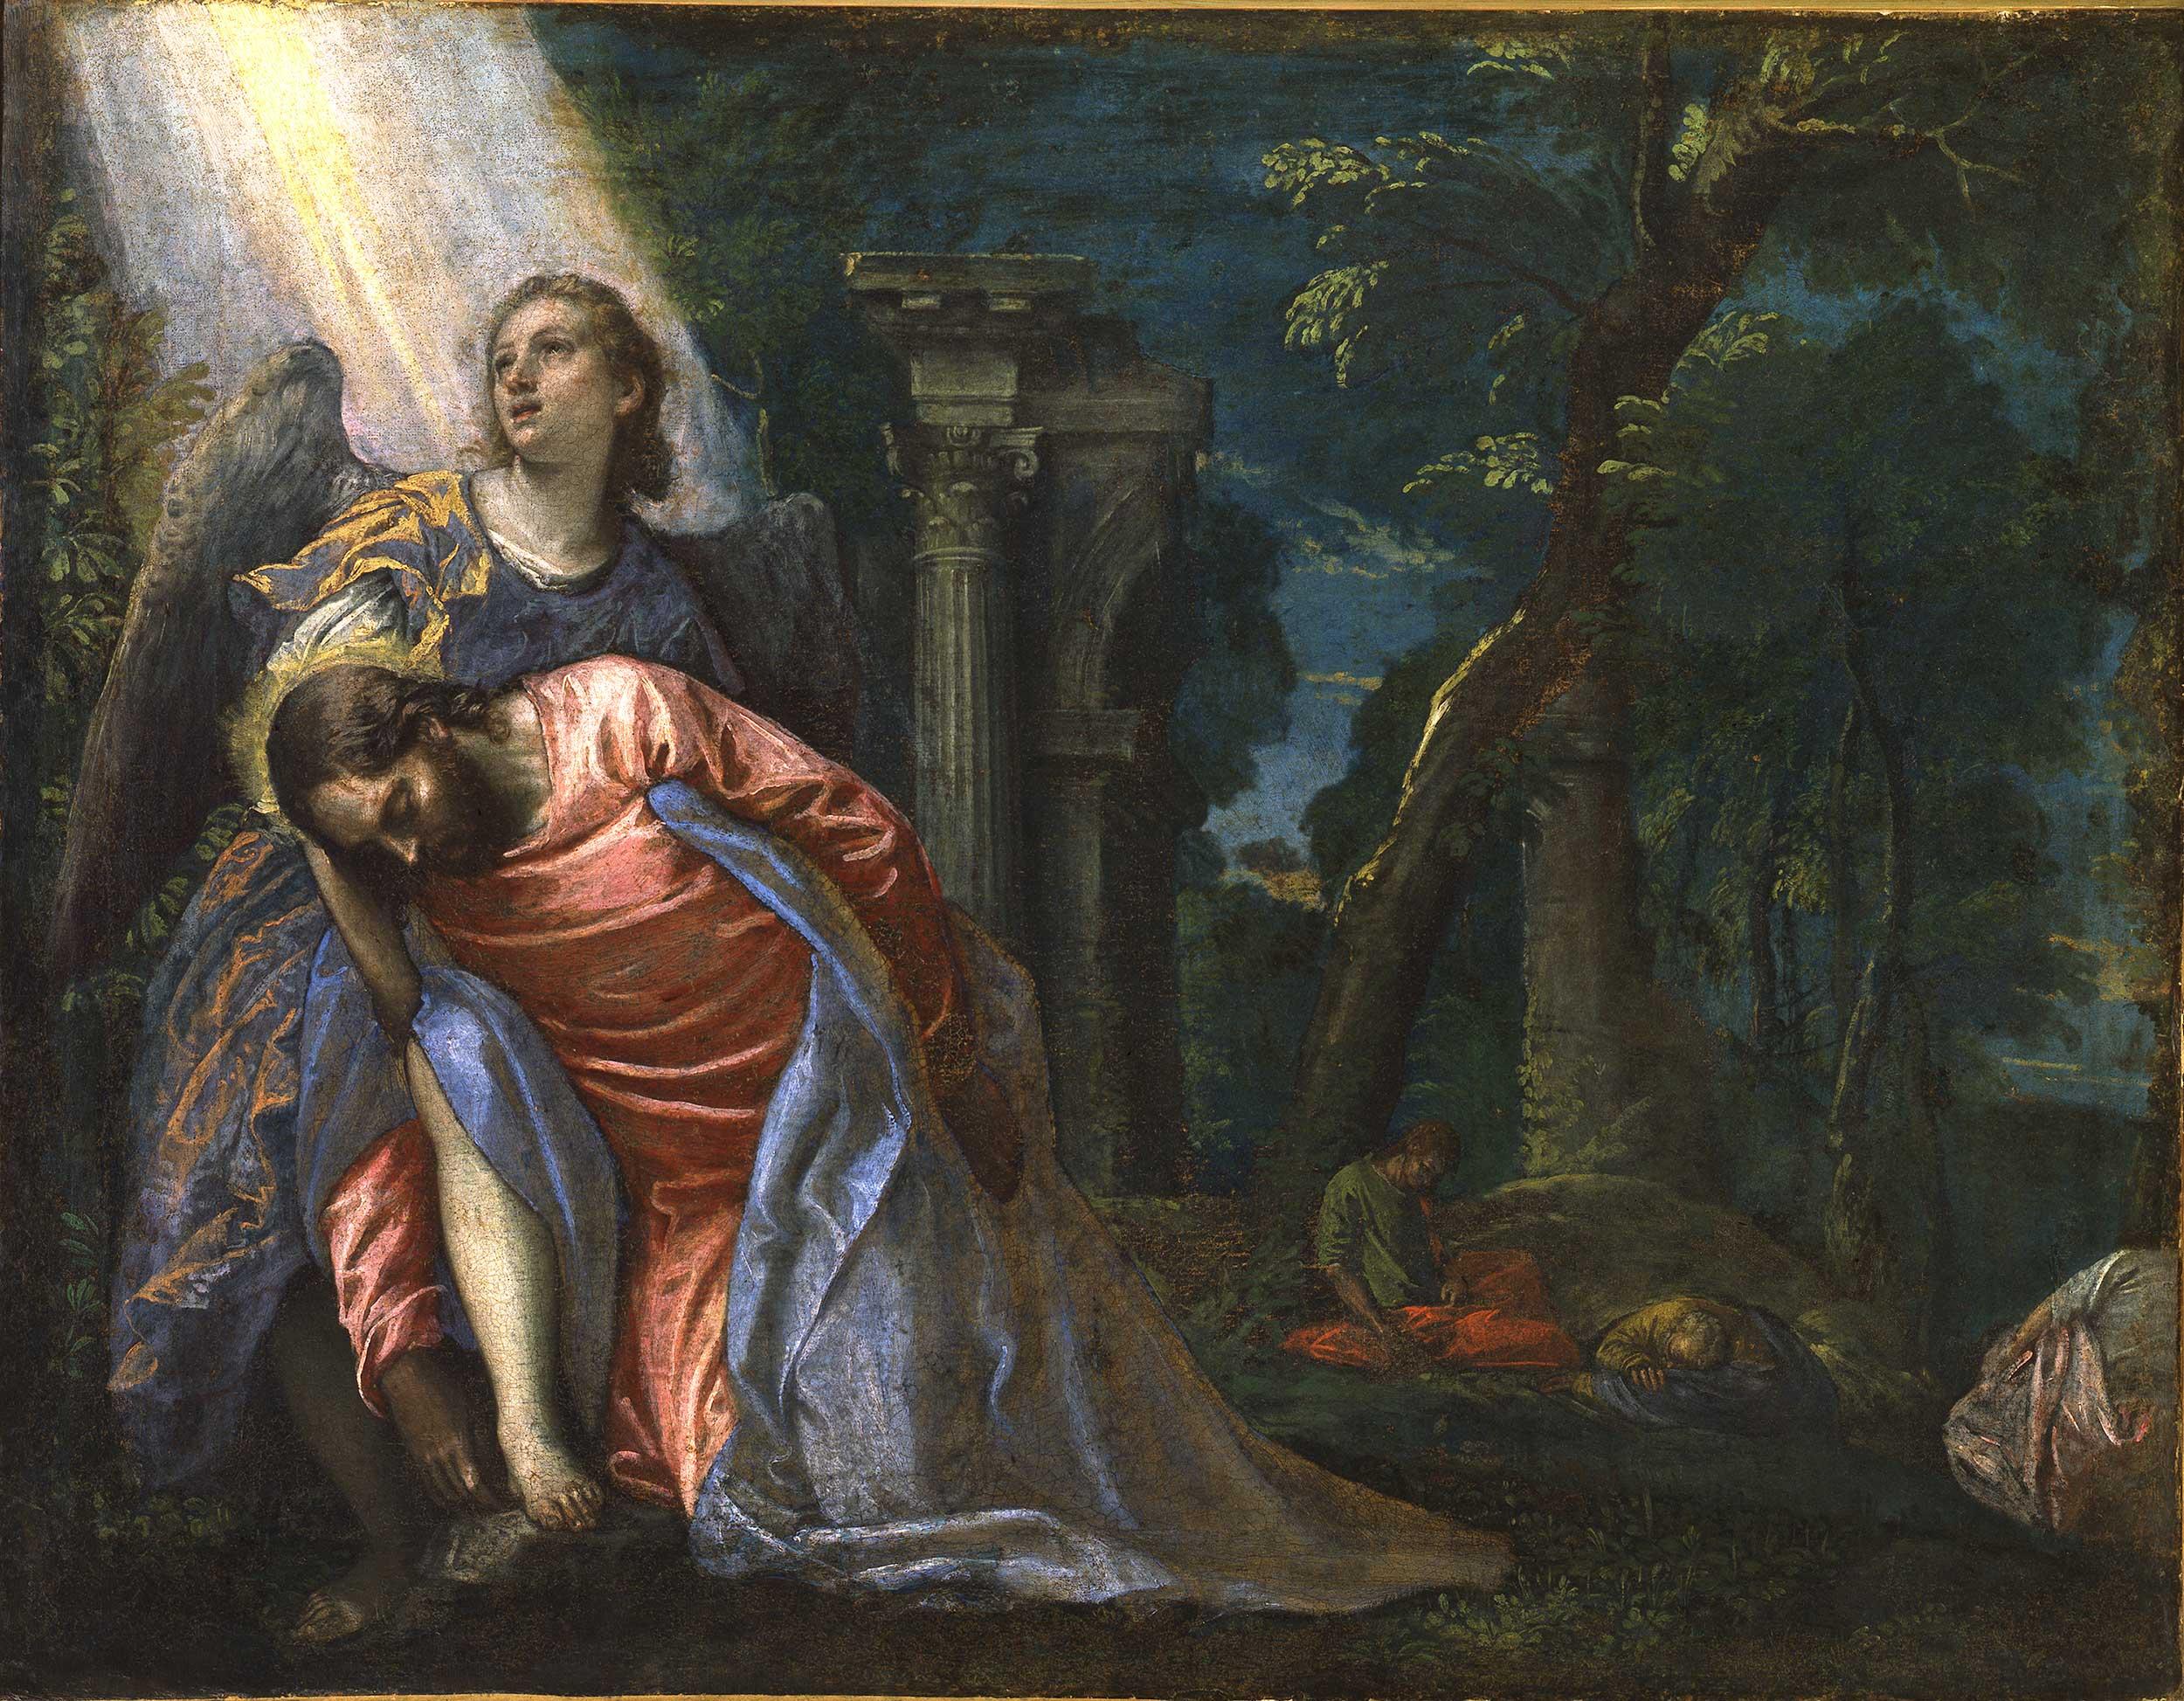 Christ in the garden of gethsemane pinacoteca di brera - Jesus in the garden of gethsemane ...